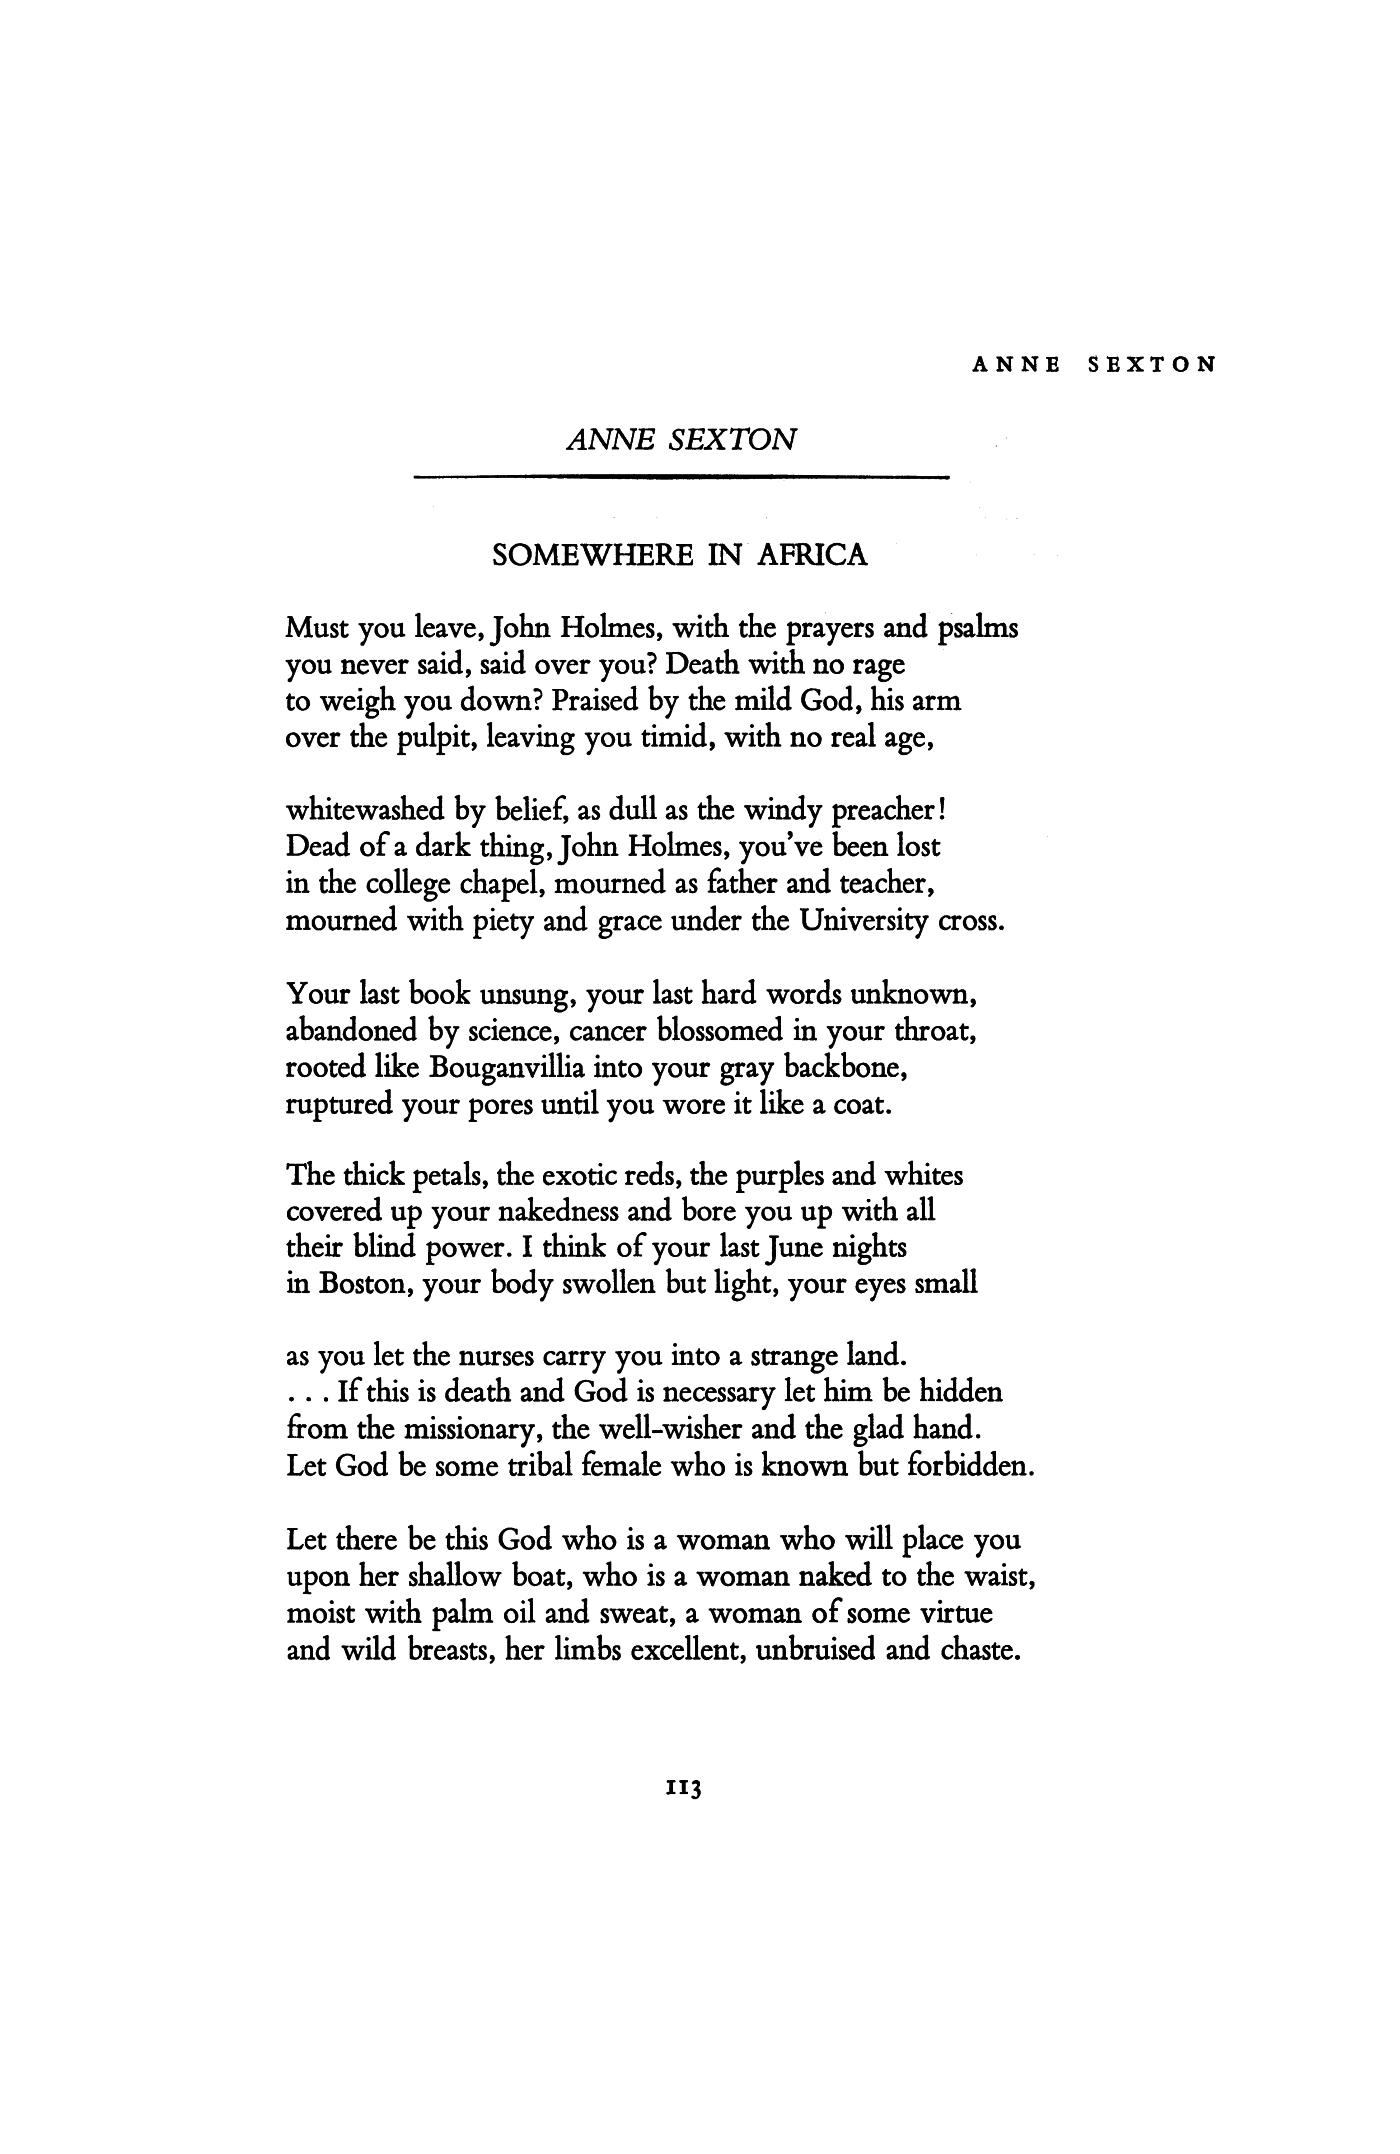 anne sexton poem analysis